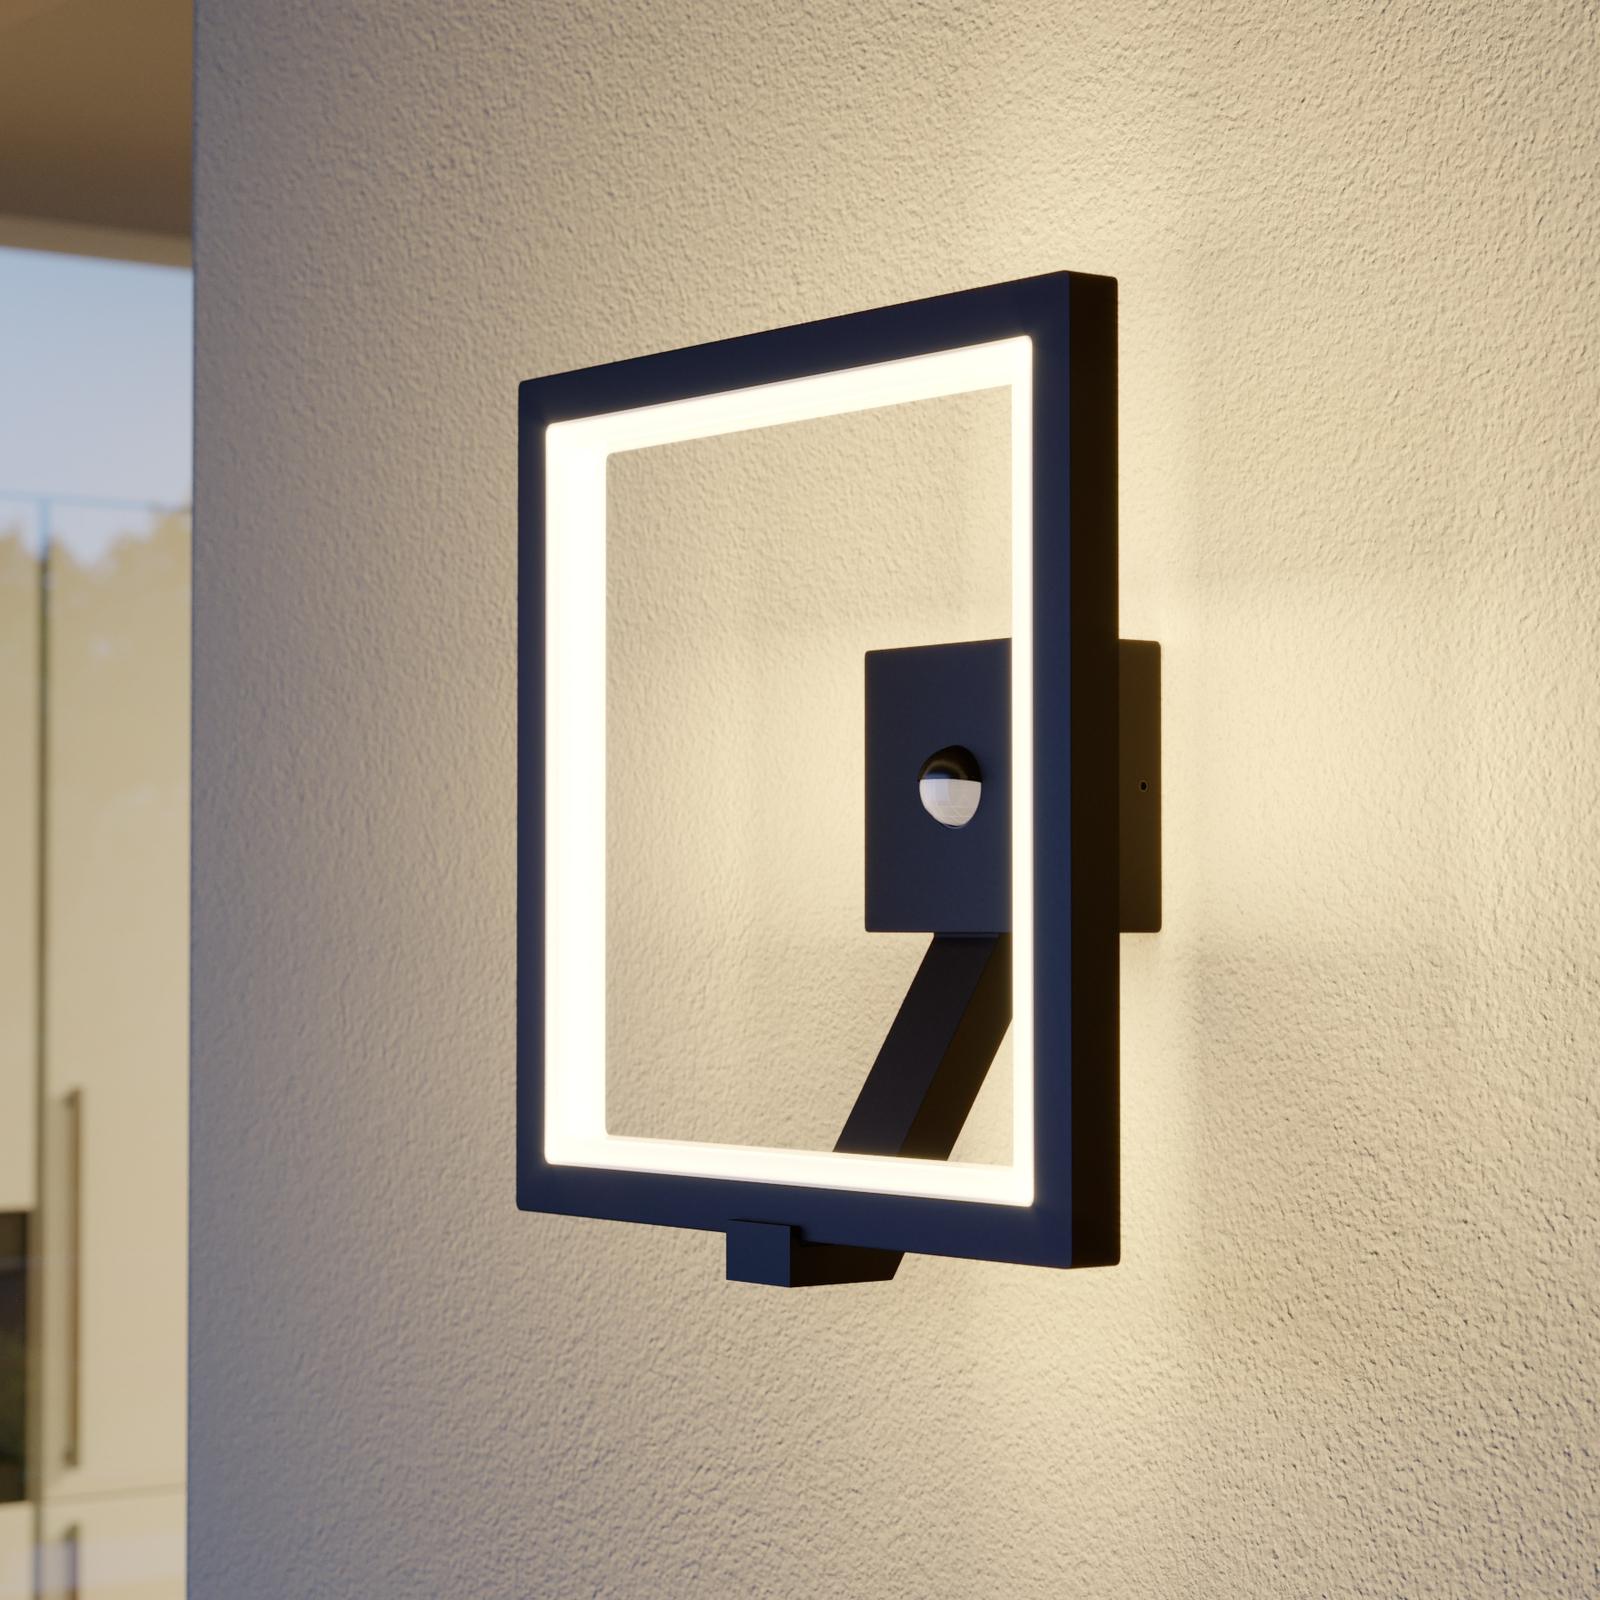 LED-Außenwandlampe Square, graphitgrau, mit Sensor